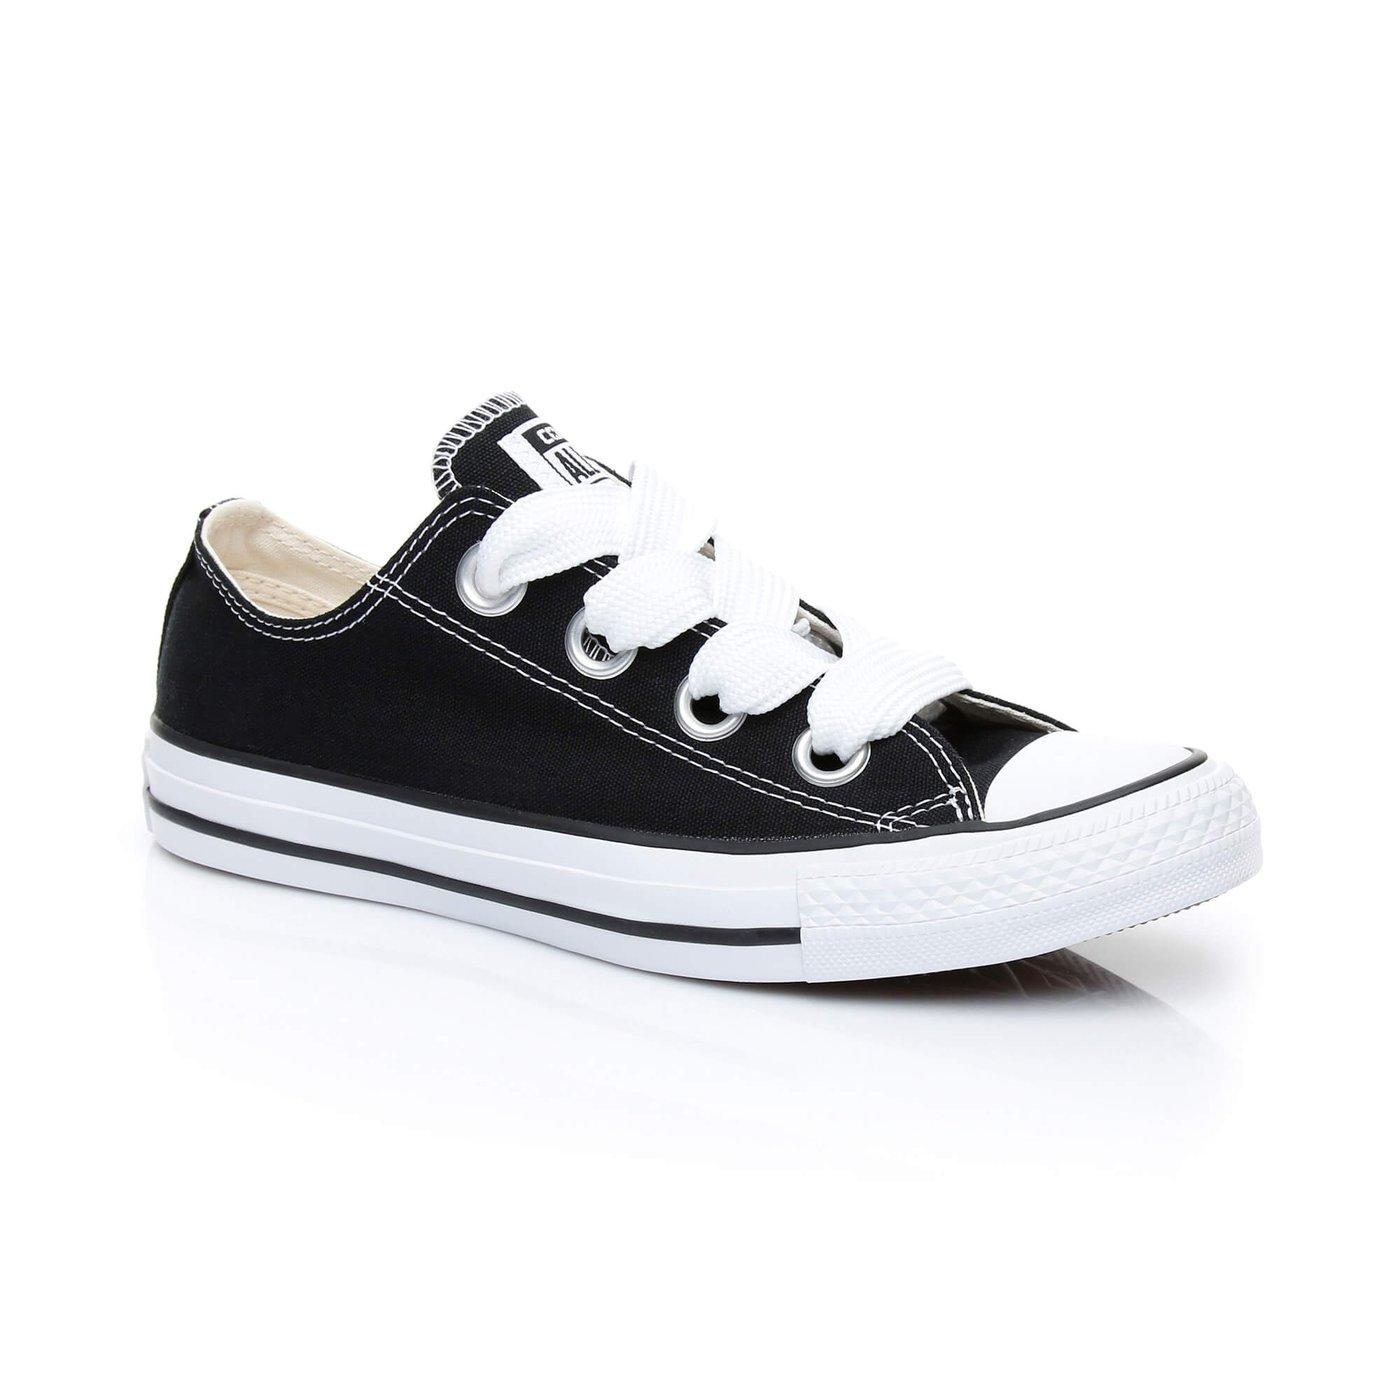 Converse Chuck Taylor All Star Big Eyelets Kadın Siyah Sneaker